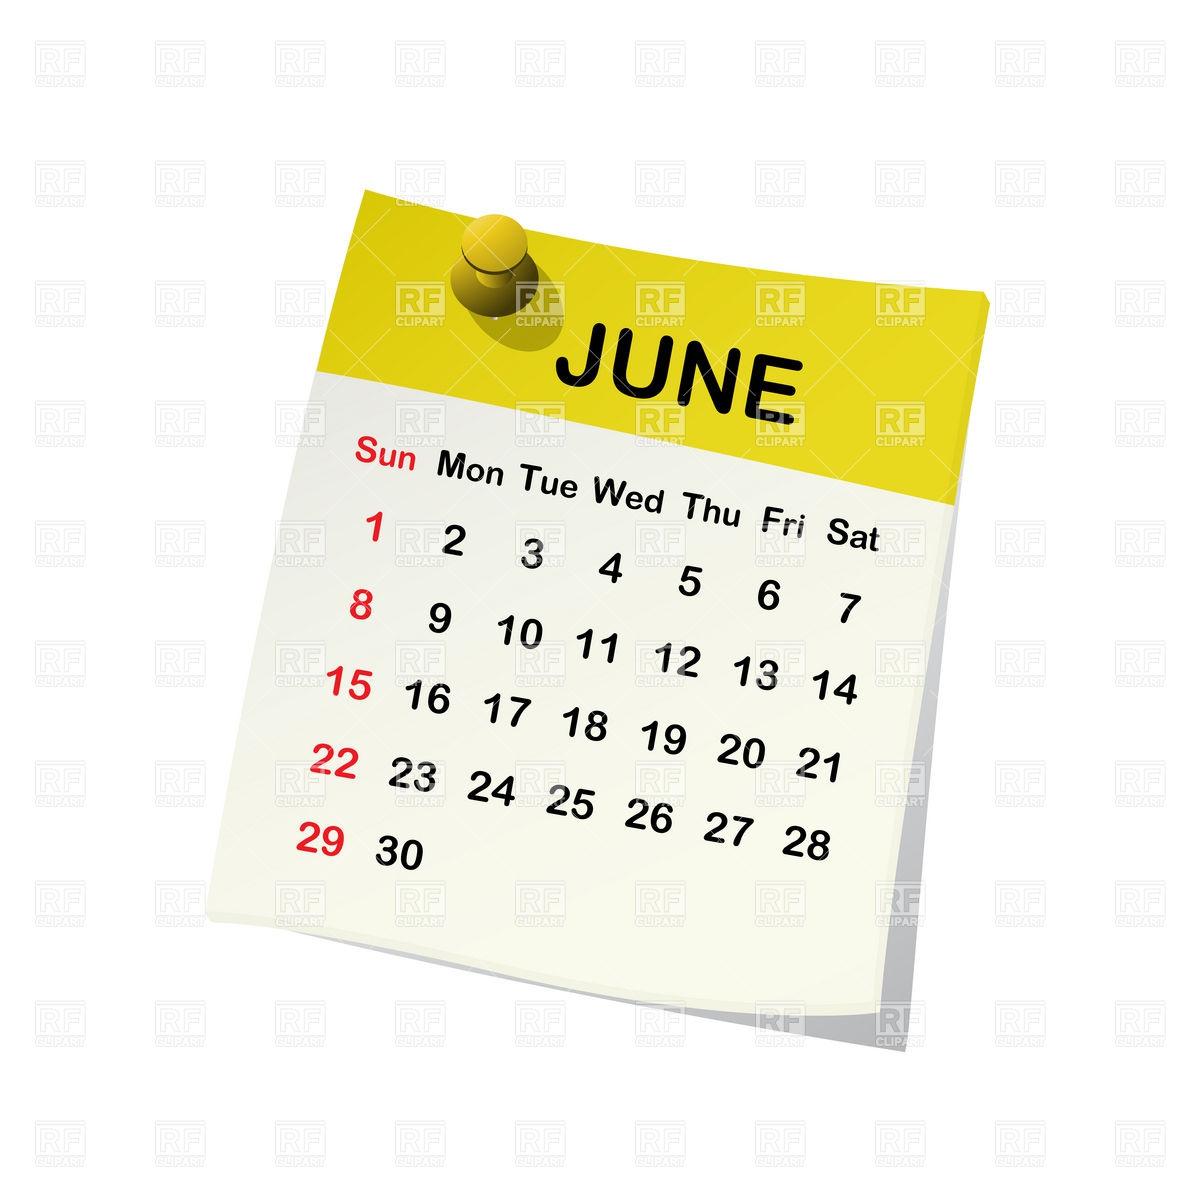 Clipart calendar 12th june vector black and white download June 6 calendar clipart clipground jpg - Clipartix vector black and white download